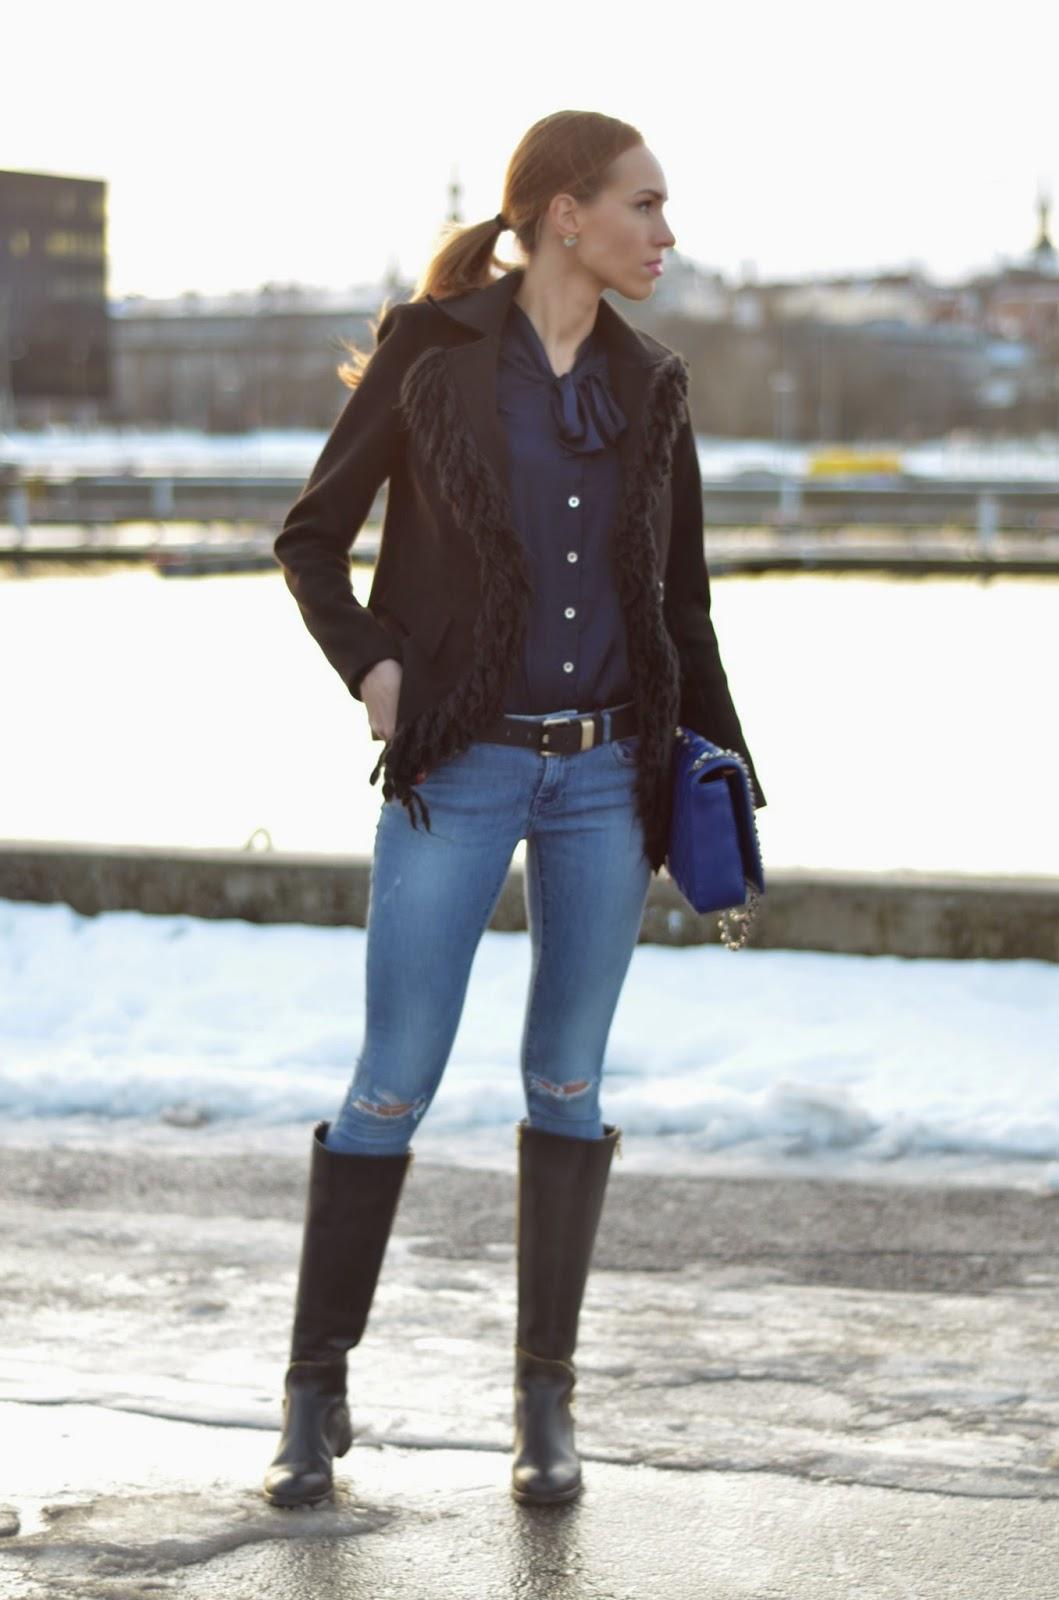 monton-fringe-jacket-zara-jeans-noa-boots kristjaana mere